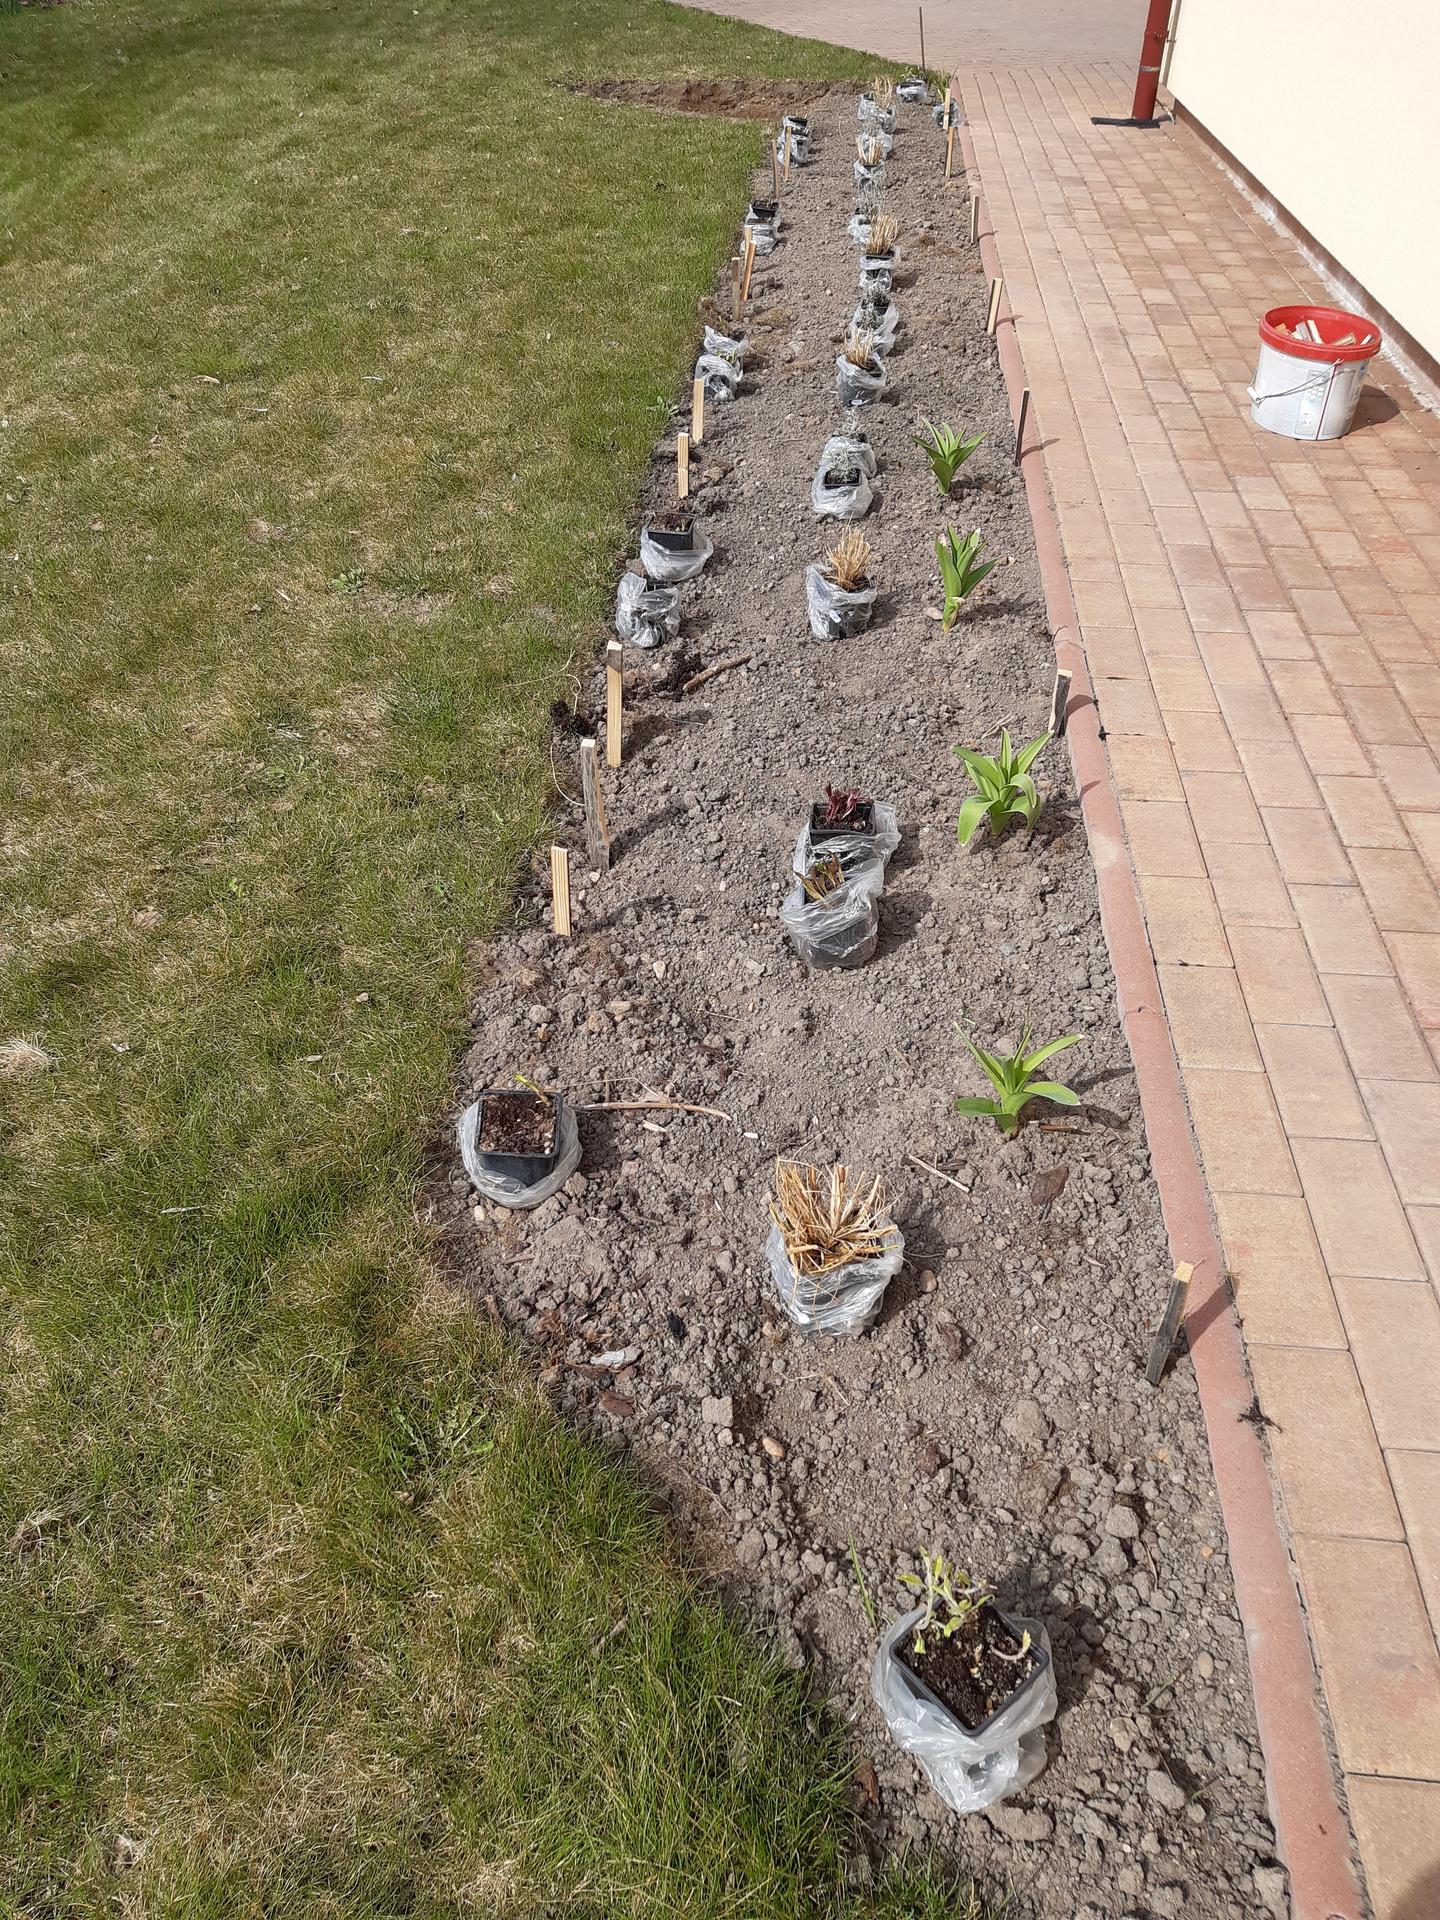 Zahrada 2021 - Byla to fuška...